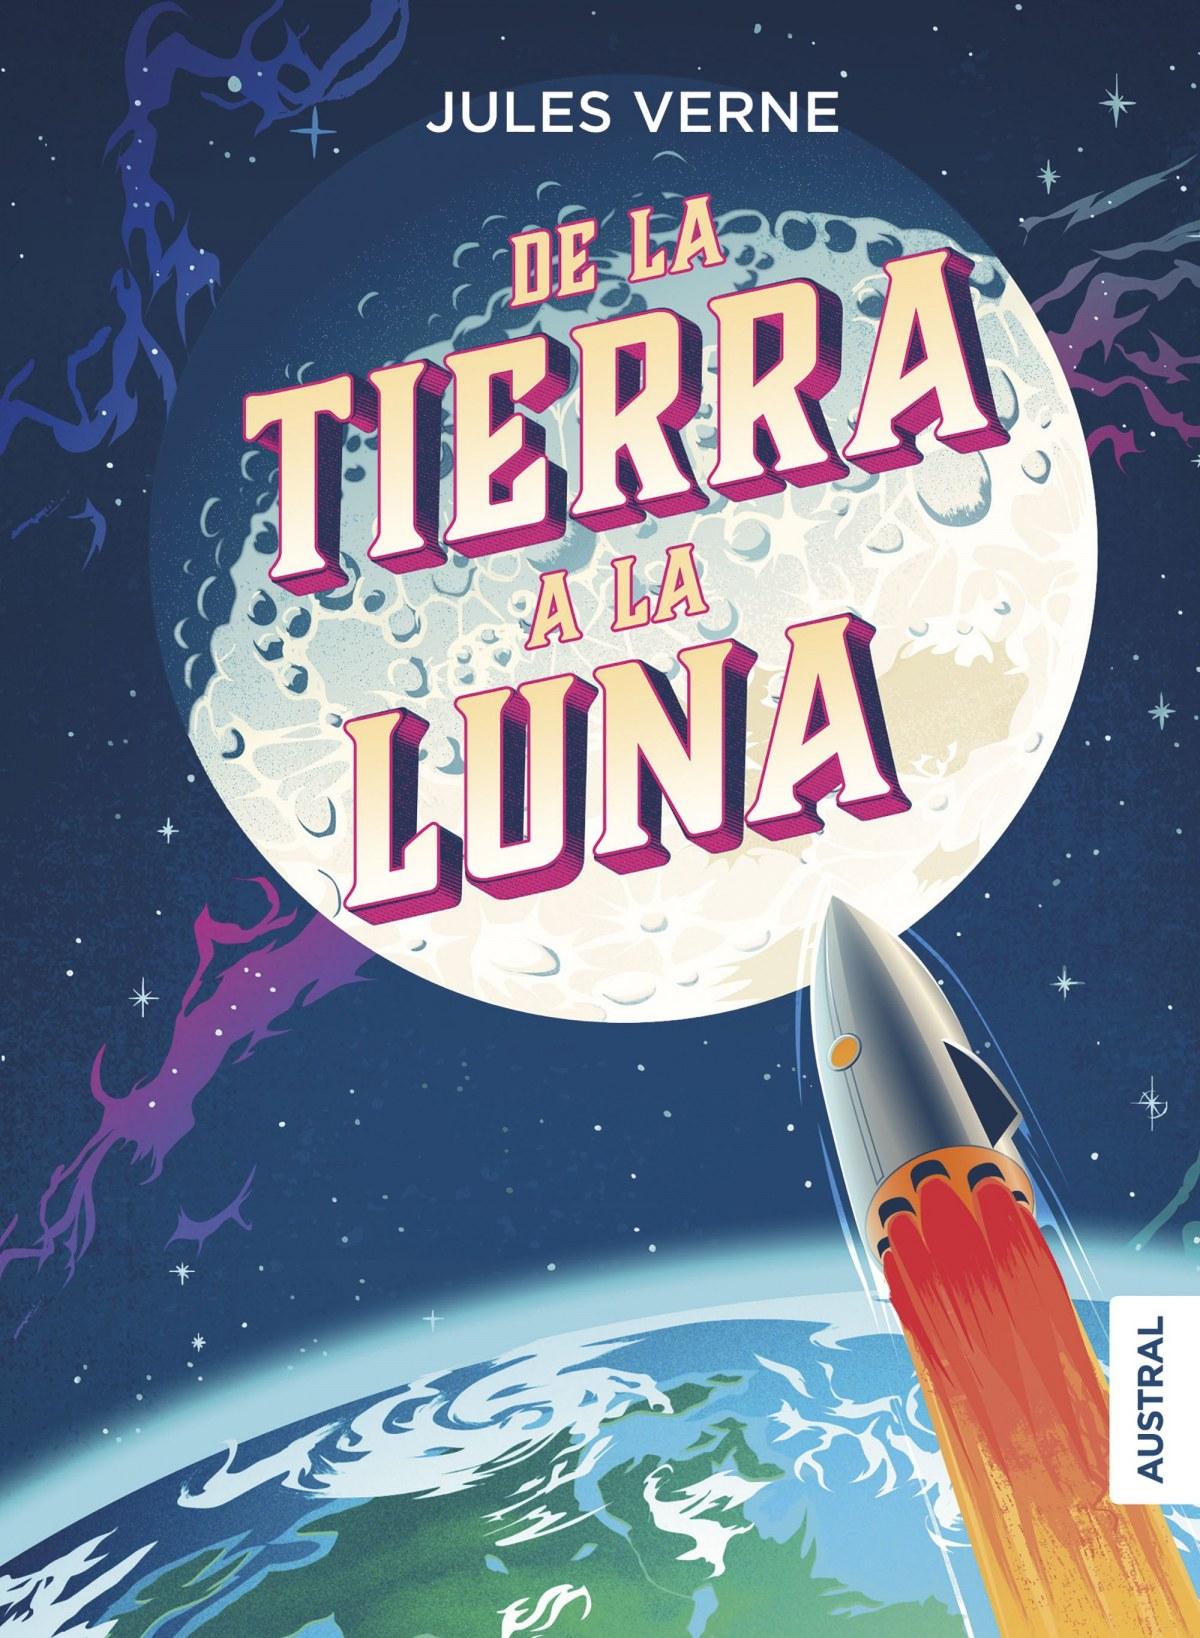 DE LA TIERRA A LA LUNA 9788408215103